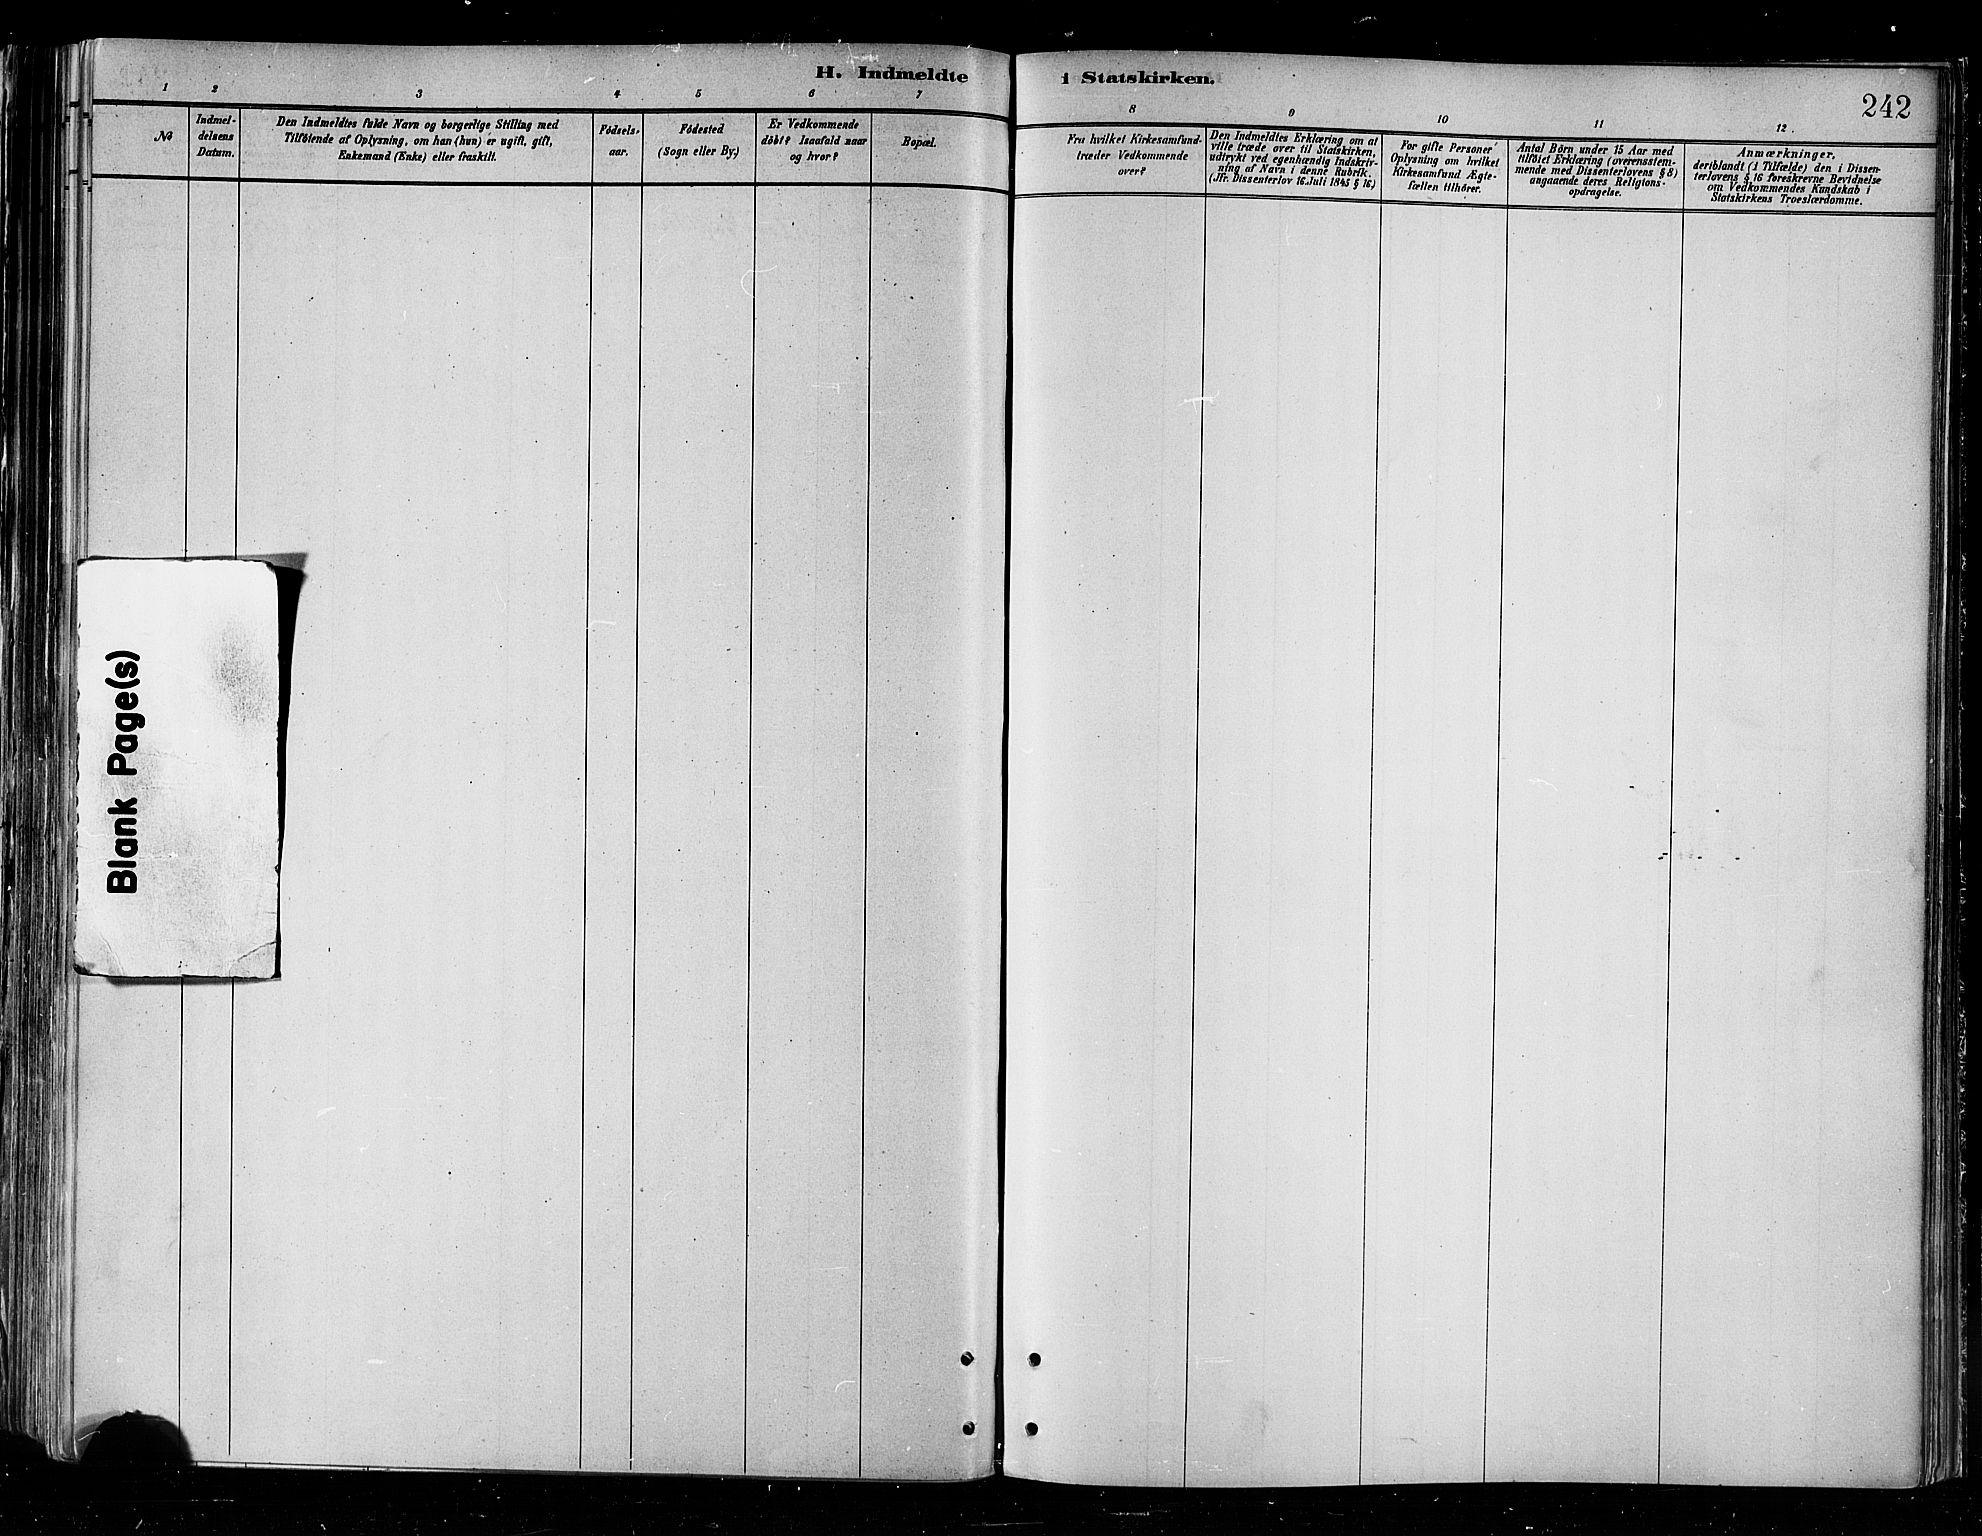 SATØ, Skjervøy sokneprestkontor, H/Ha/Haa/L0010kirke: Ministerialbok nr. 10, 1887-1898, s. 242